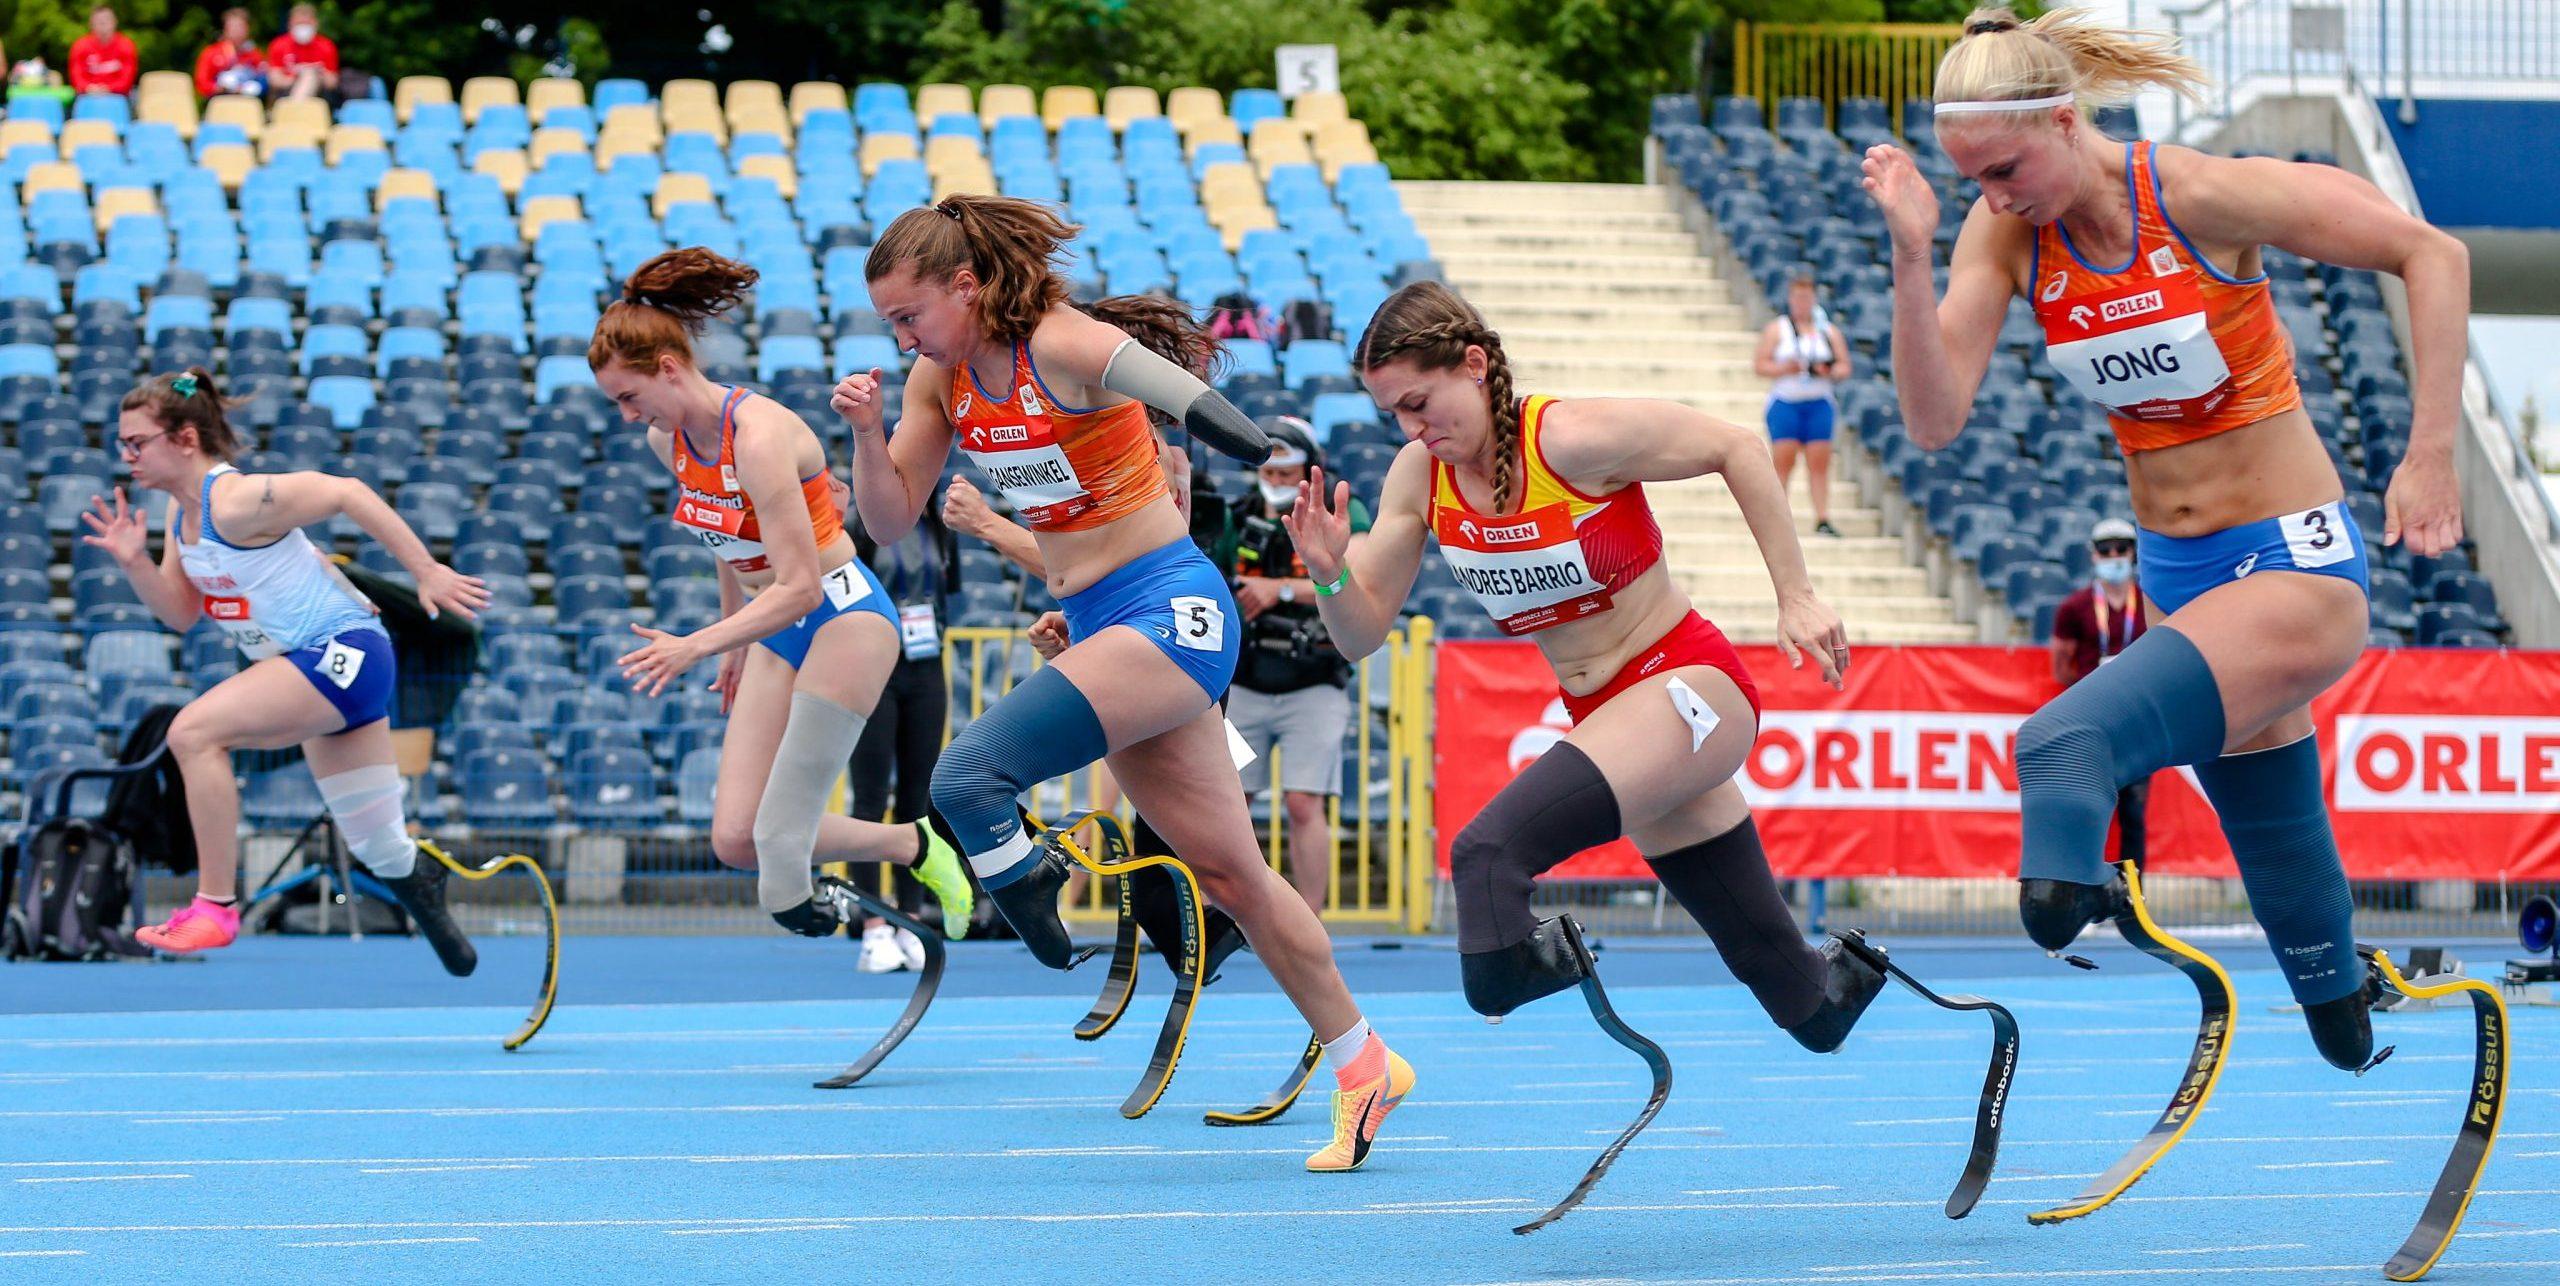 Campeonato de Europa de Atletismo Paralímpico. Fuente: CPE